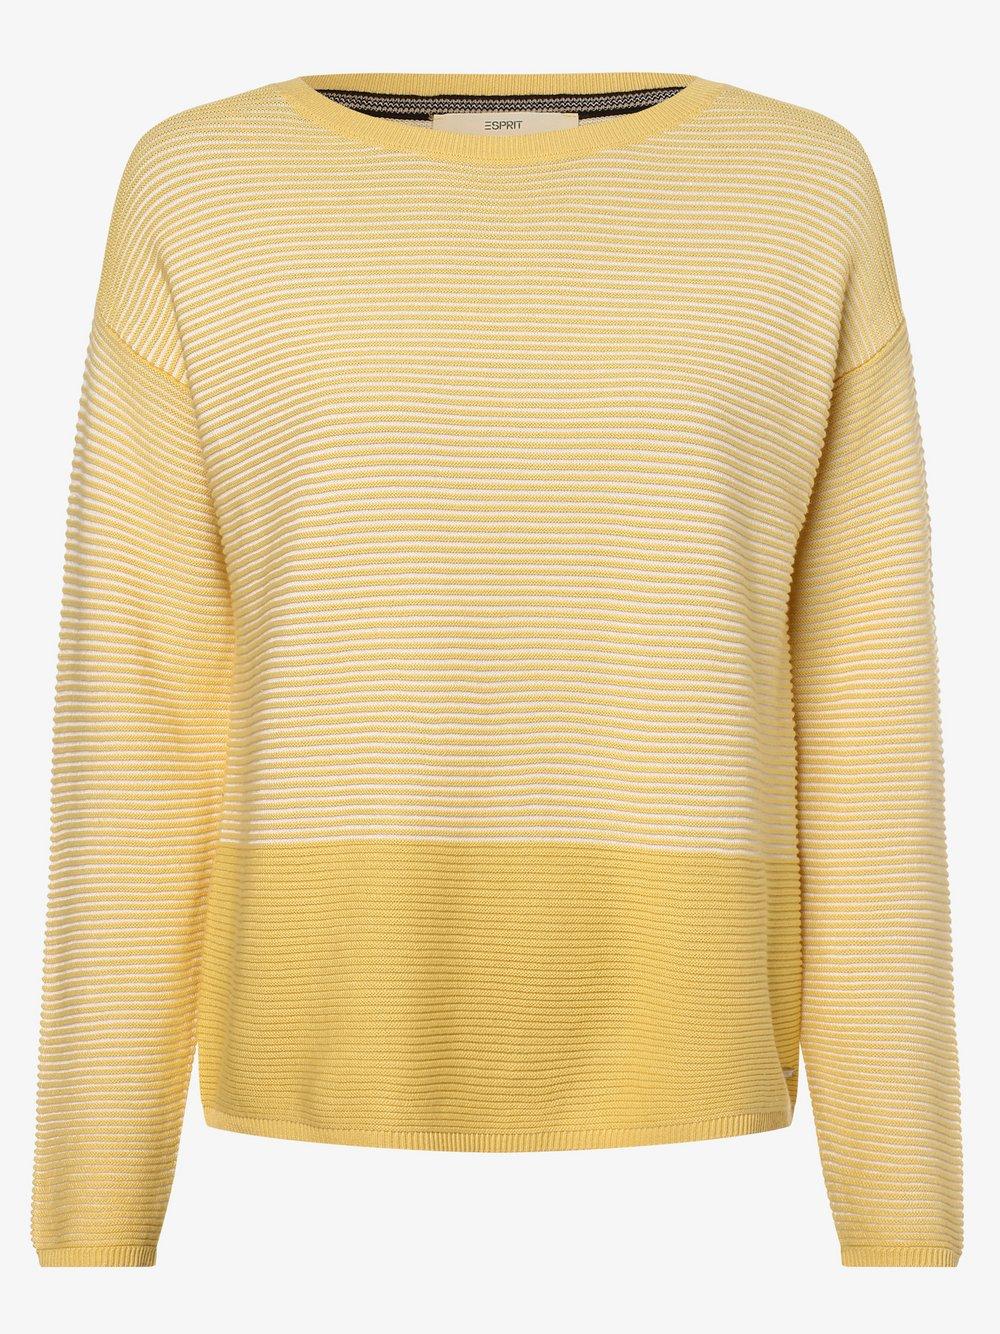 Esprit Casual - Sweter damski, żółty Esprit Casual